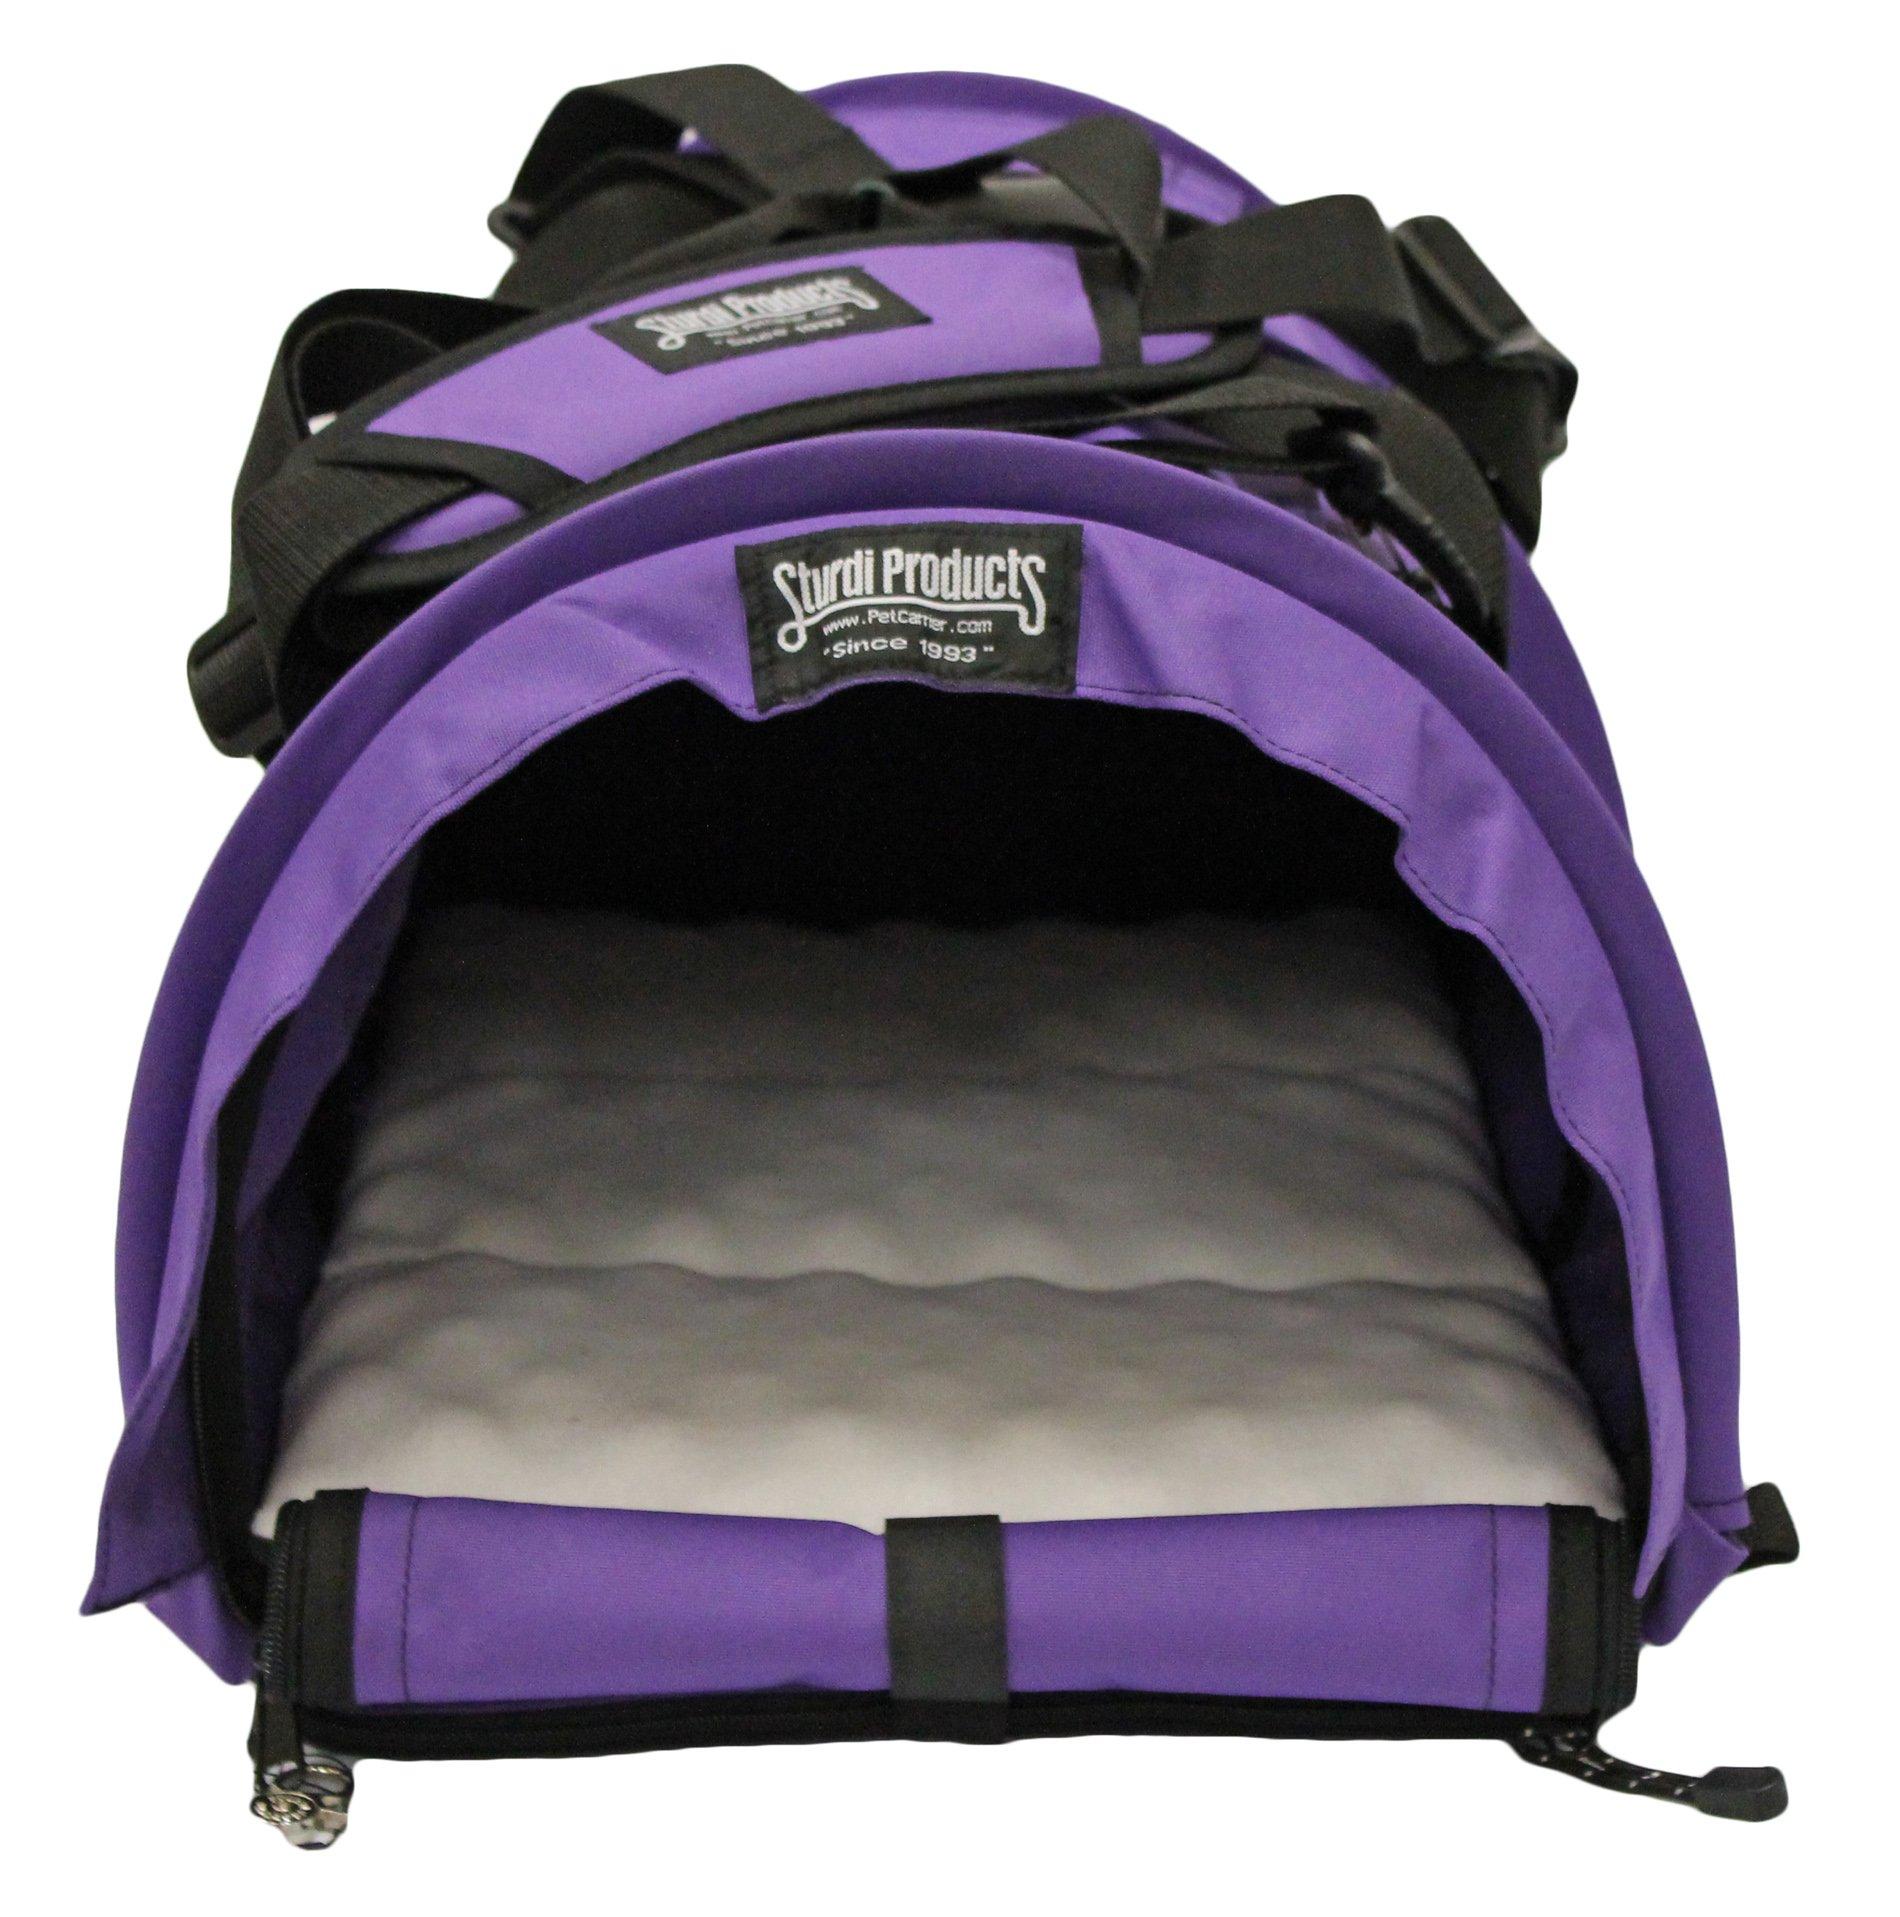 STURDI PRODUCTS SturdiBag Pet Carrier, Large, Purple by STURDI PRODUCTS